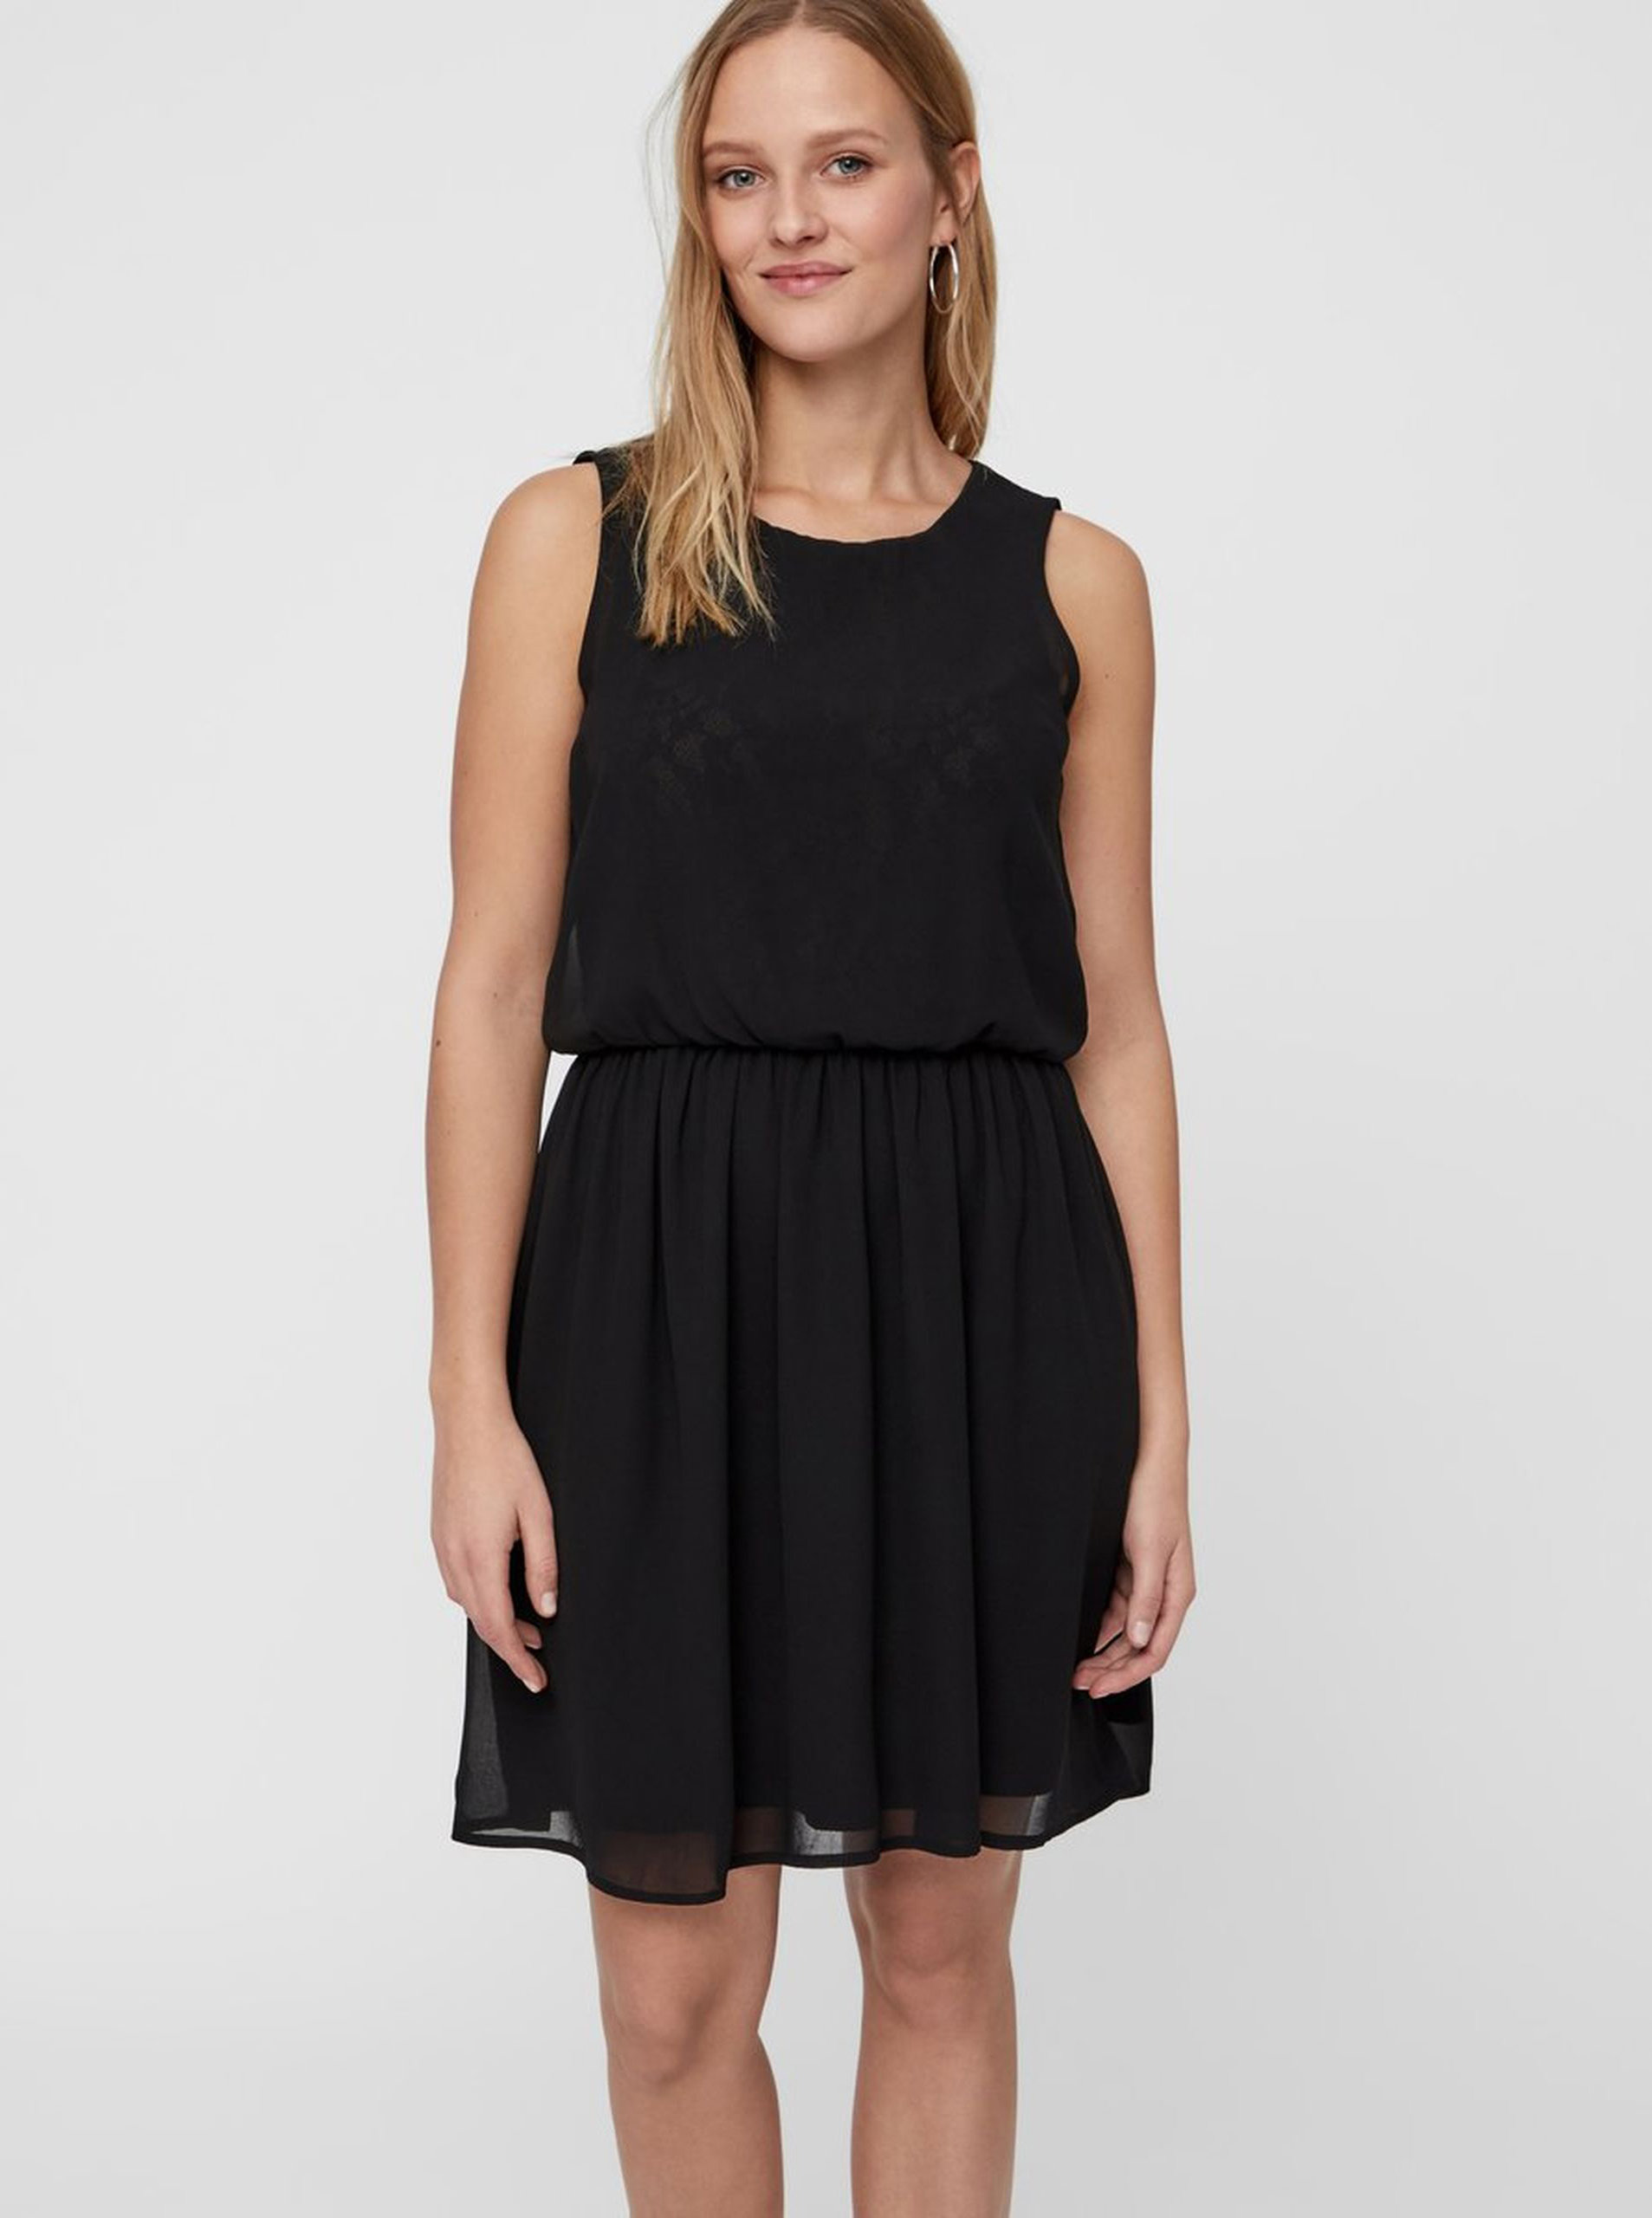 0dfc69444a0 Černé šaty s gumou v pase VERO MODA ...